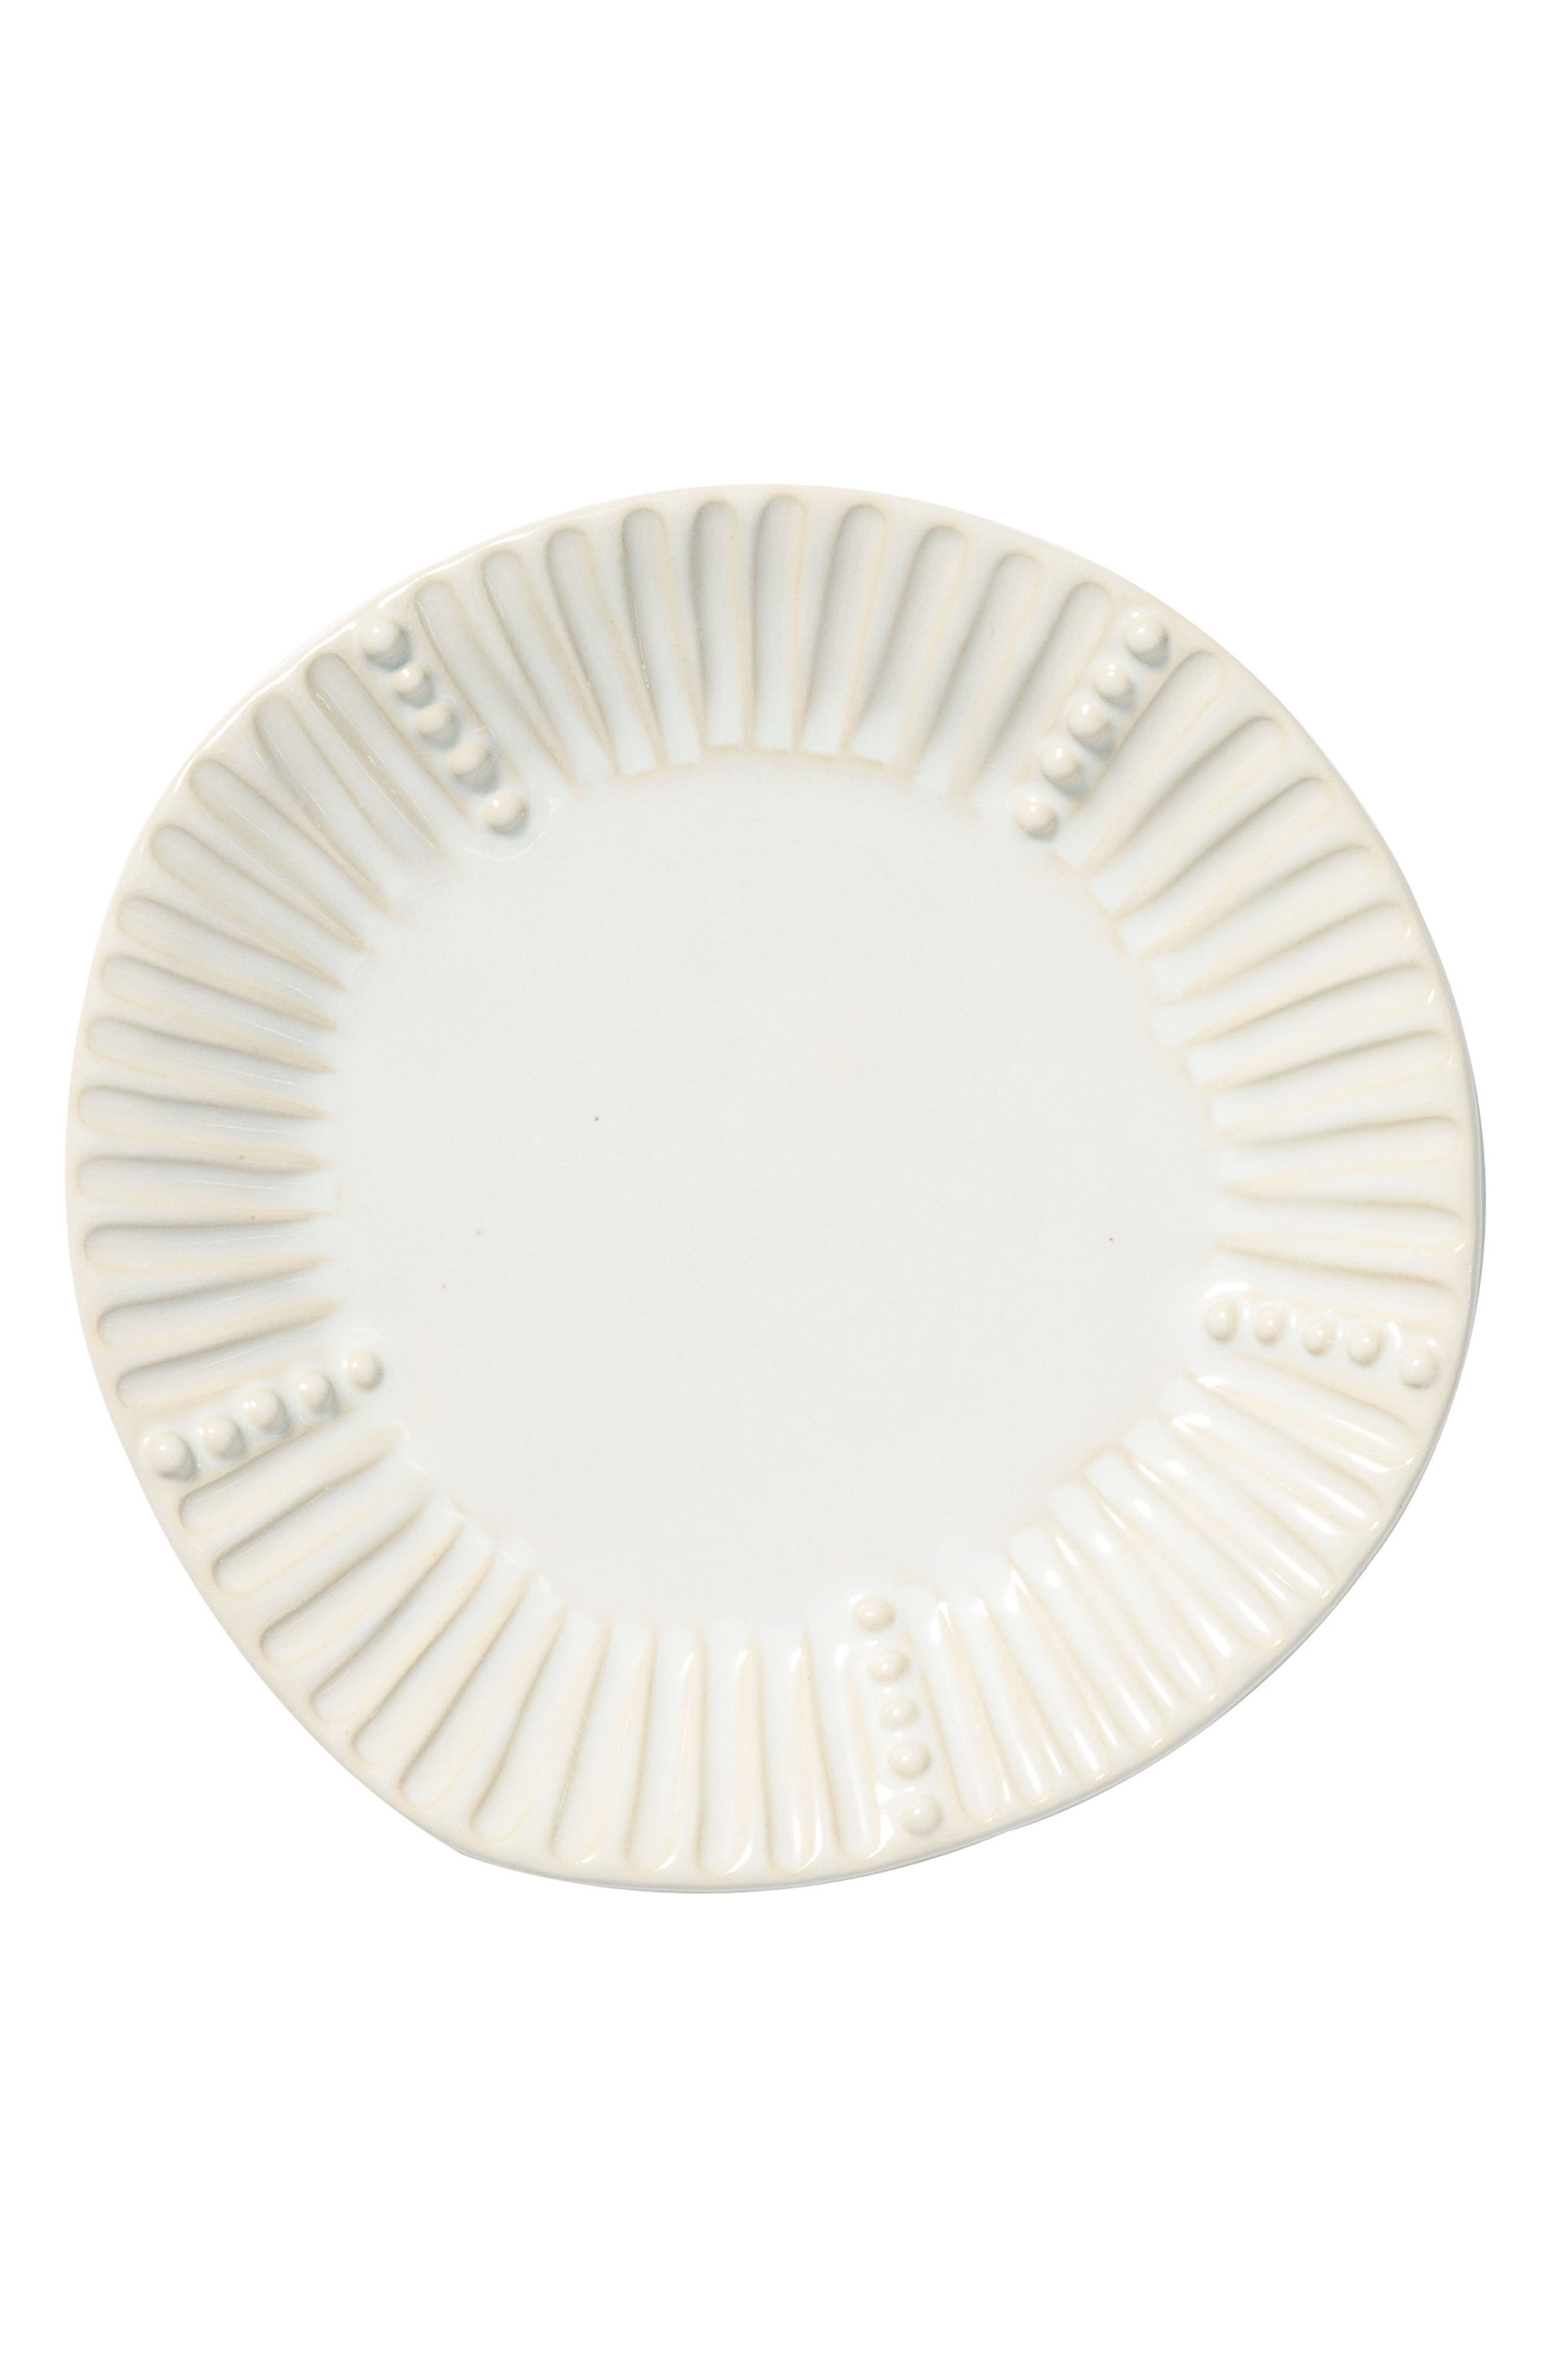 Main Image - VIETRI Incanto Stone Stripe Salad Plate